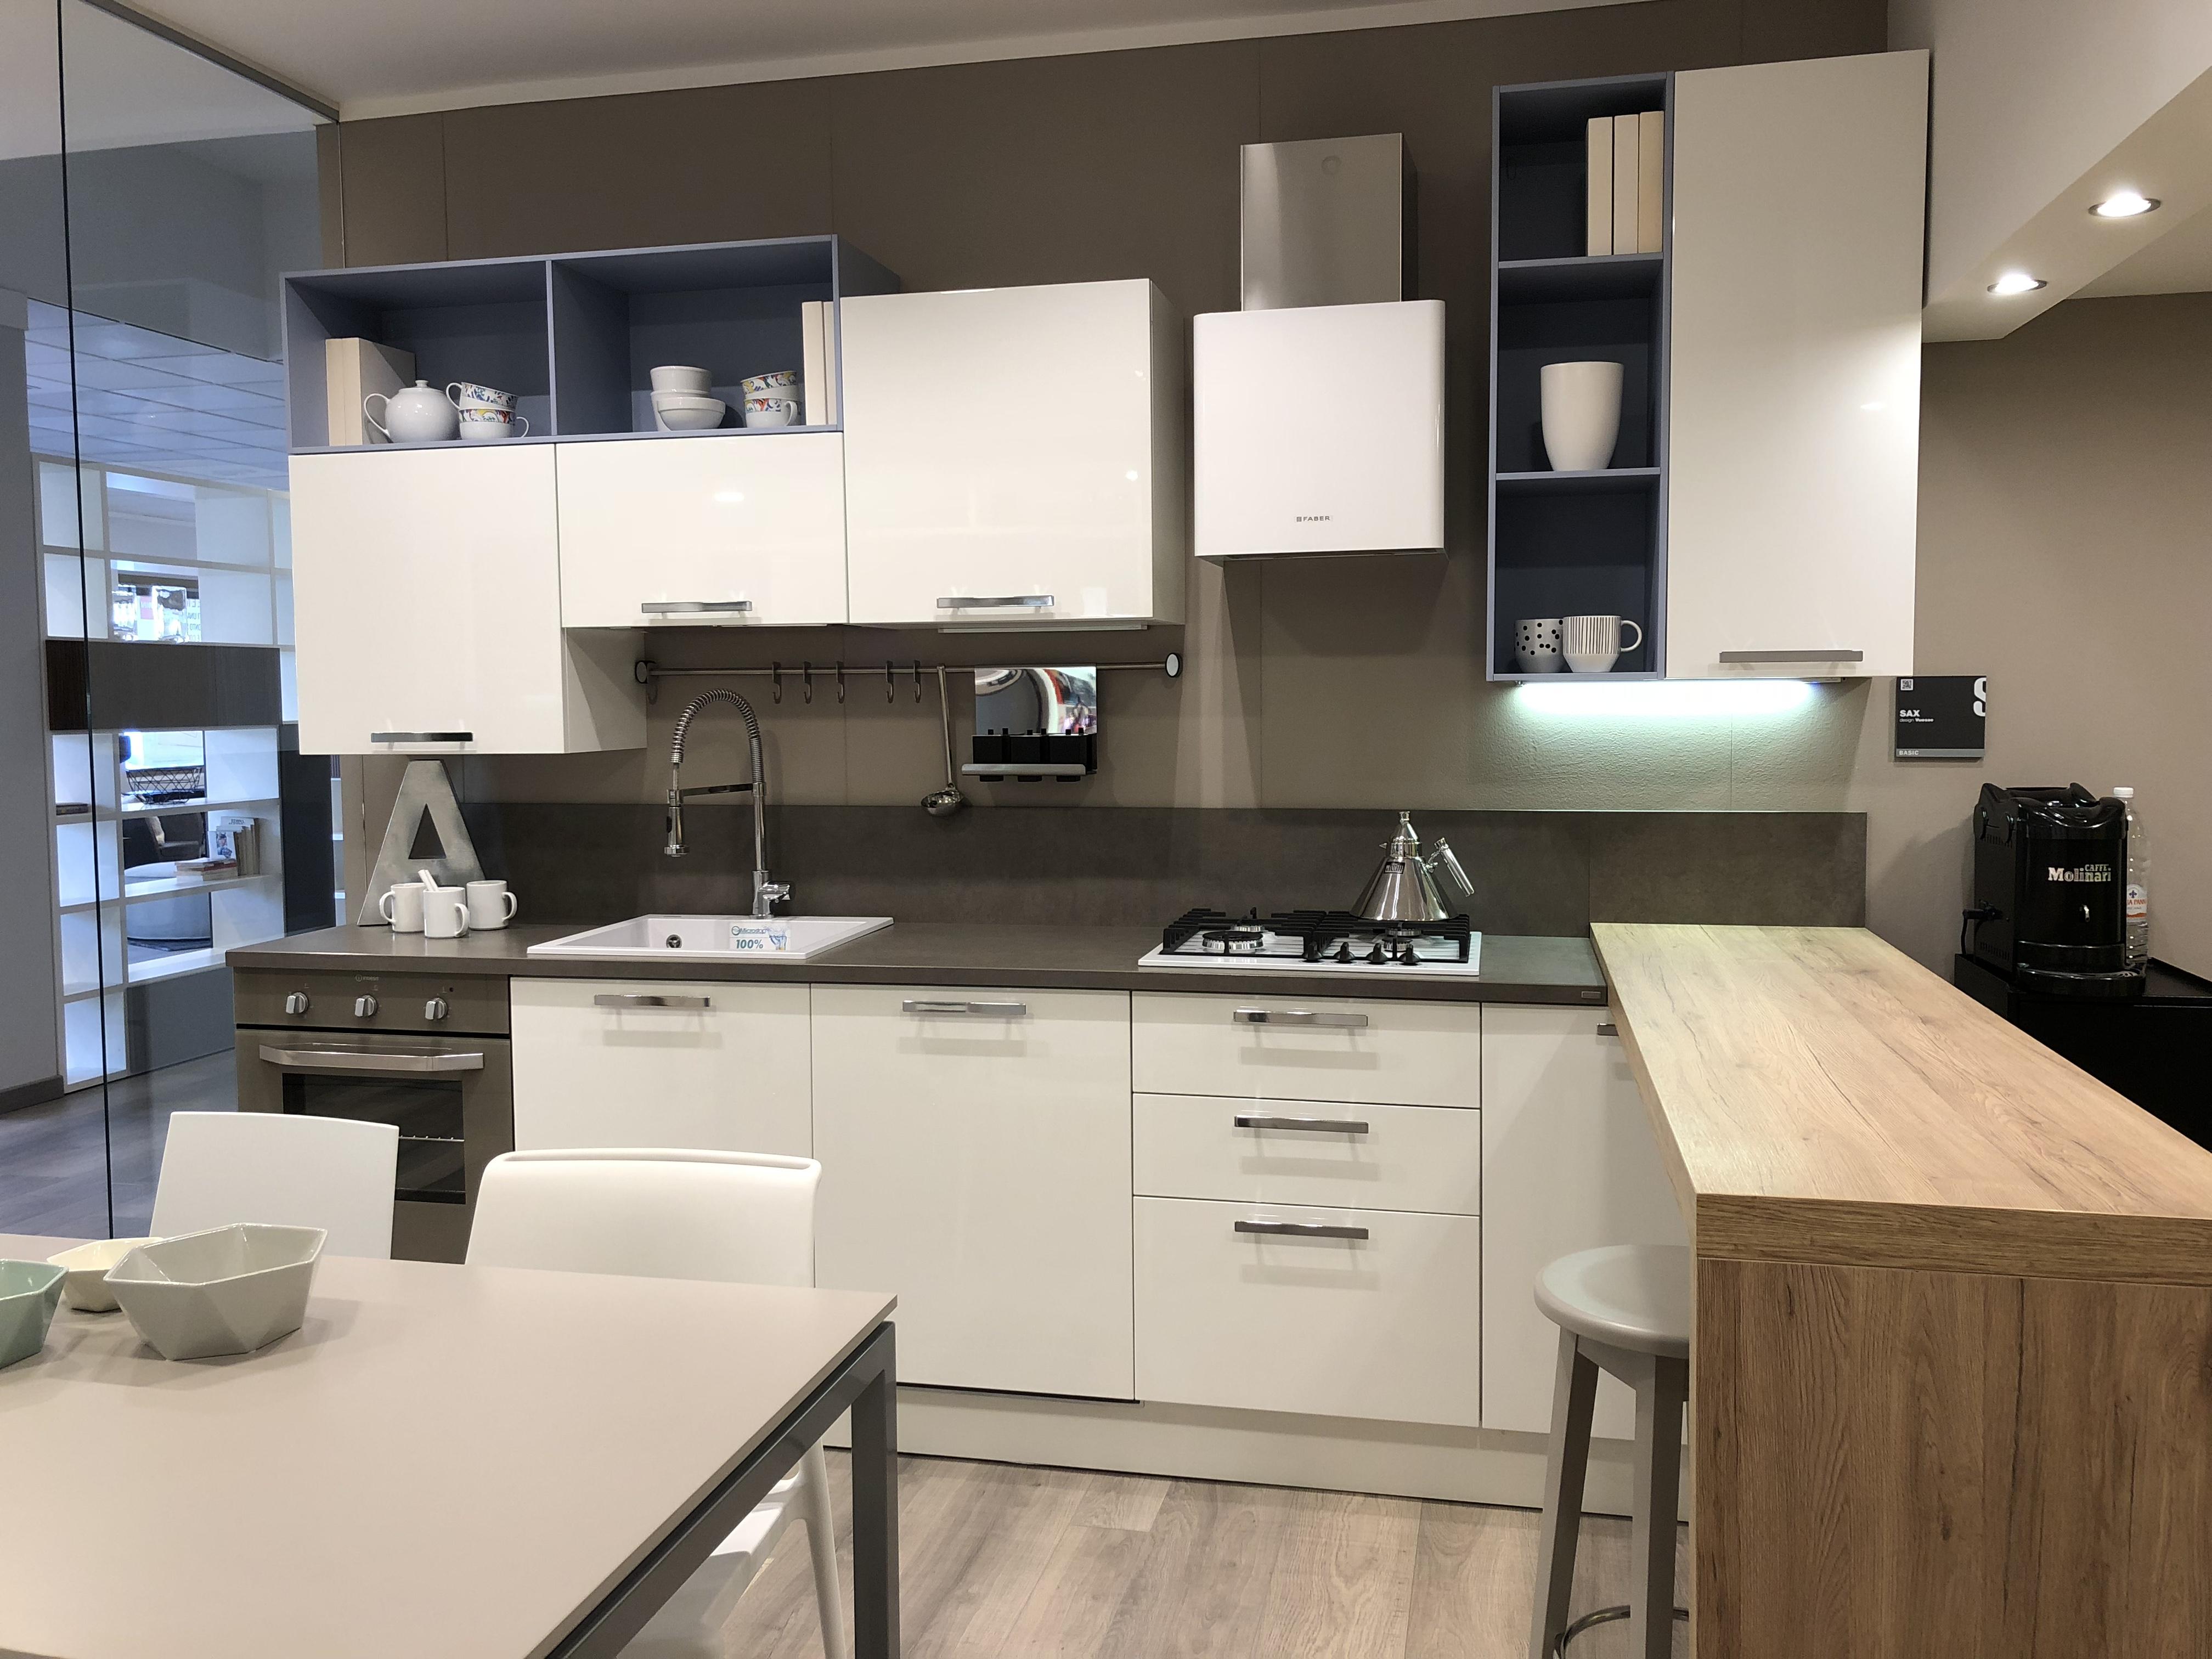 SAX Cucina Scavoliniin offerta per arredamento a Modena ...